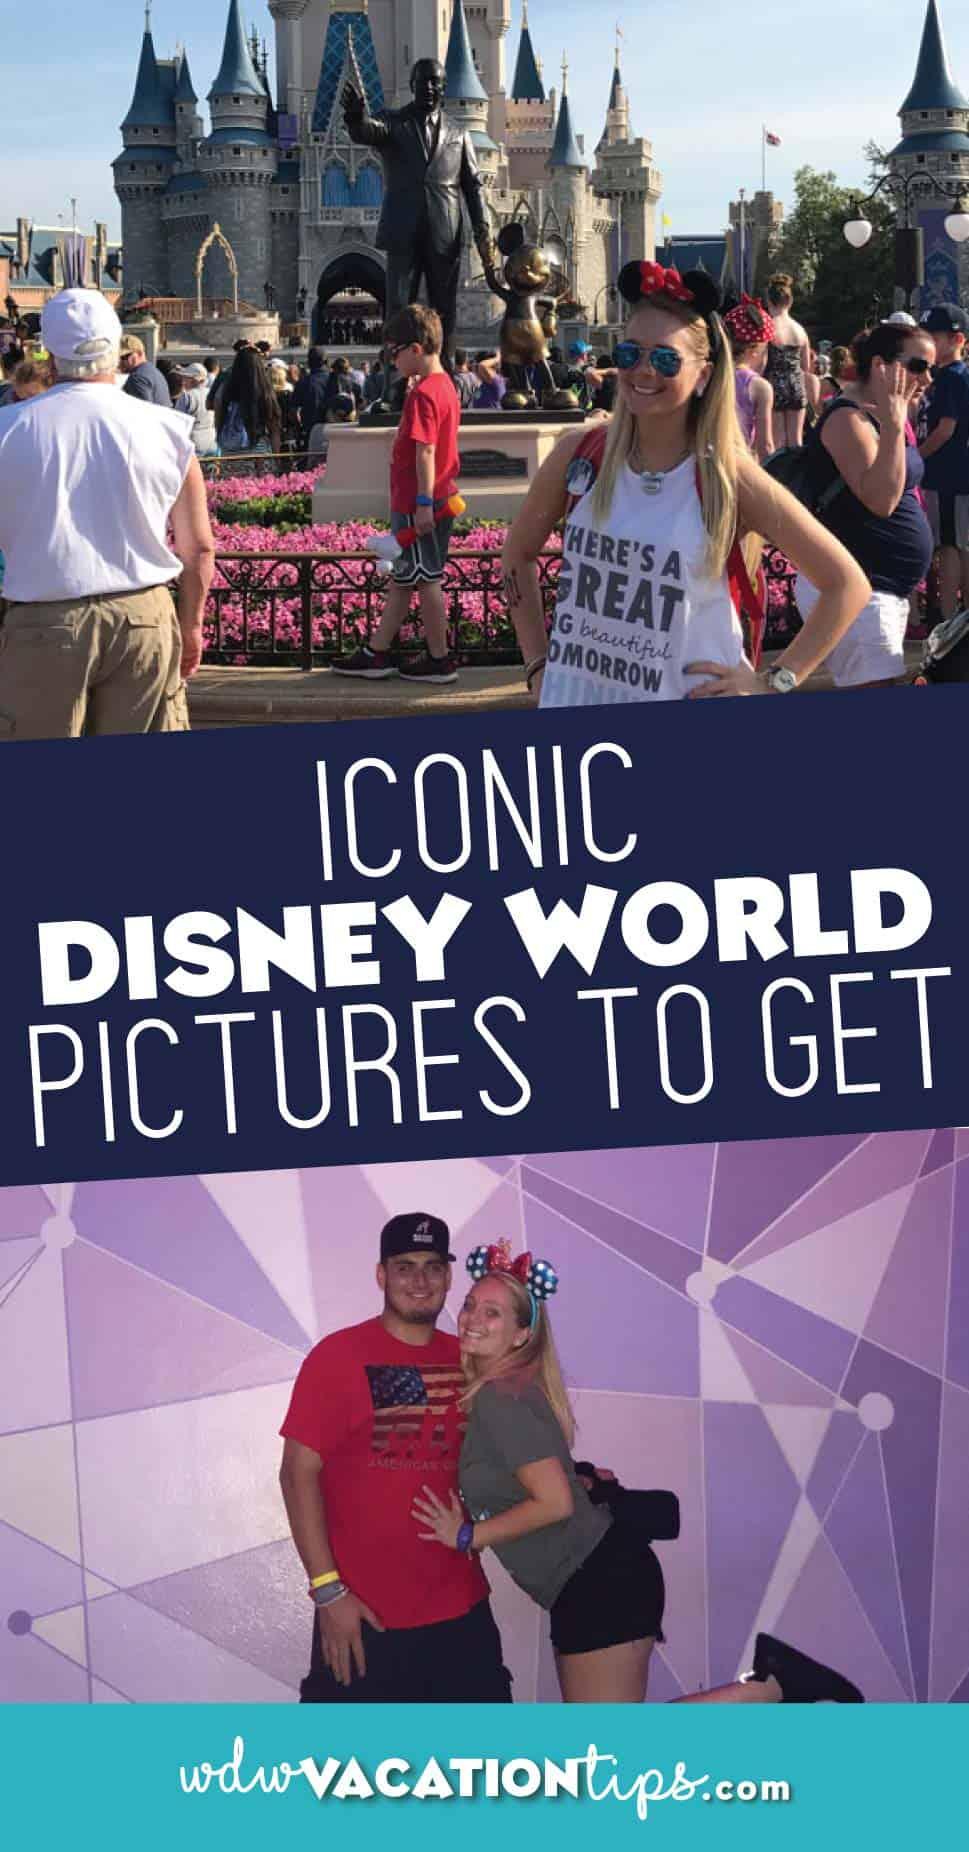 Iconic Disney World Pictures